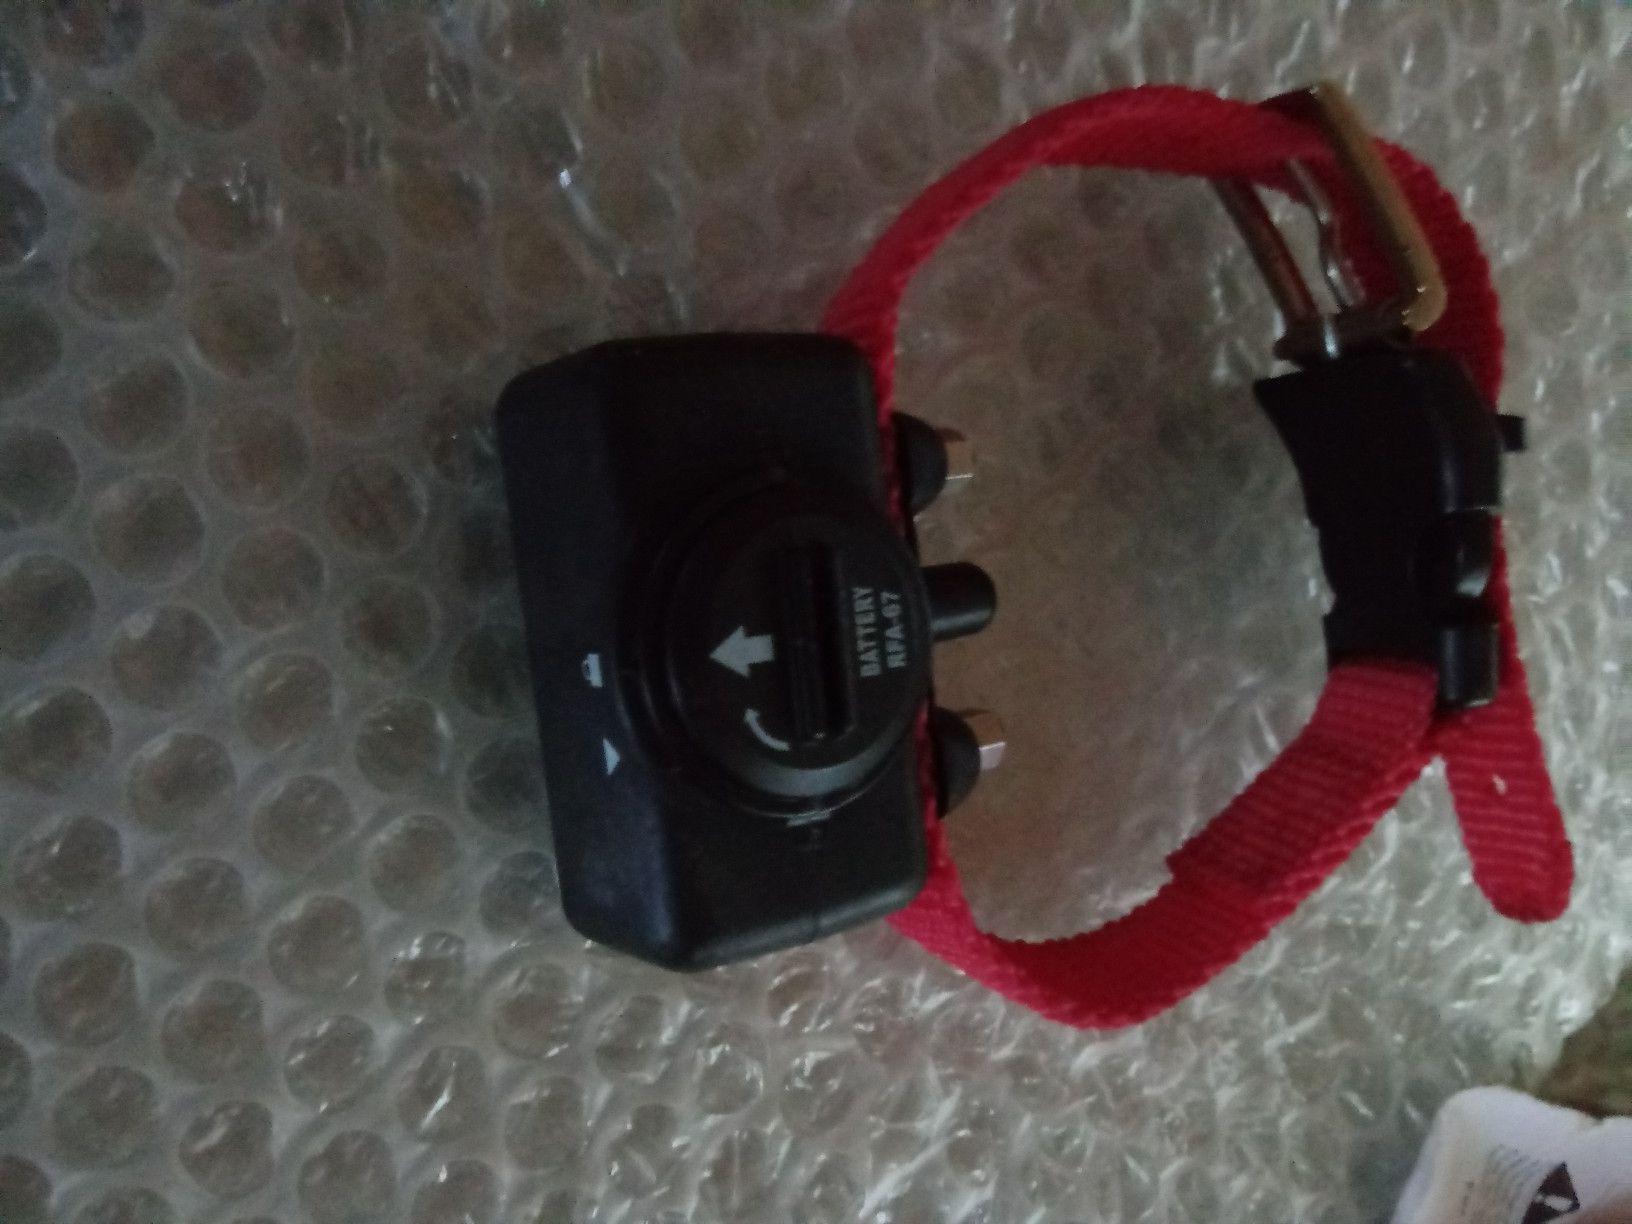 Dog shock caller